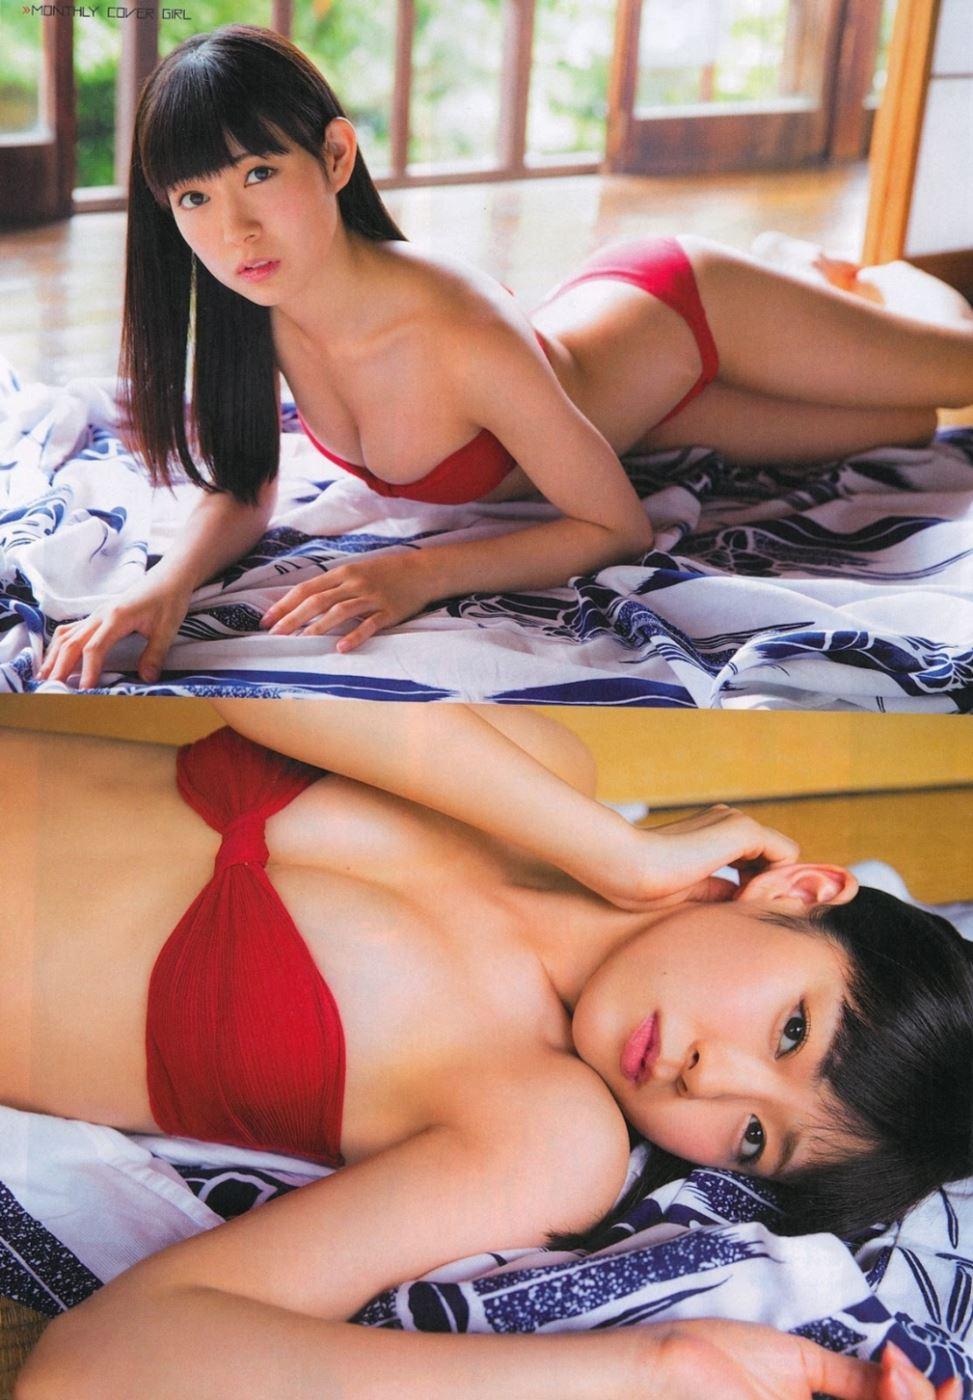 渡辺美優紀 エロ画像 18